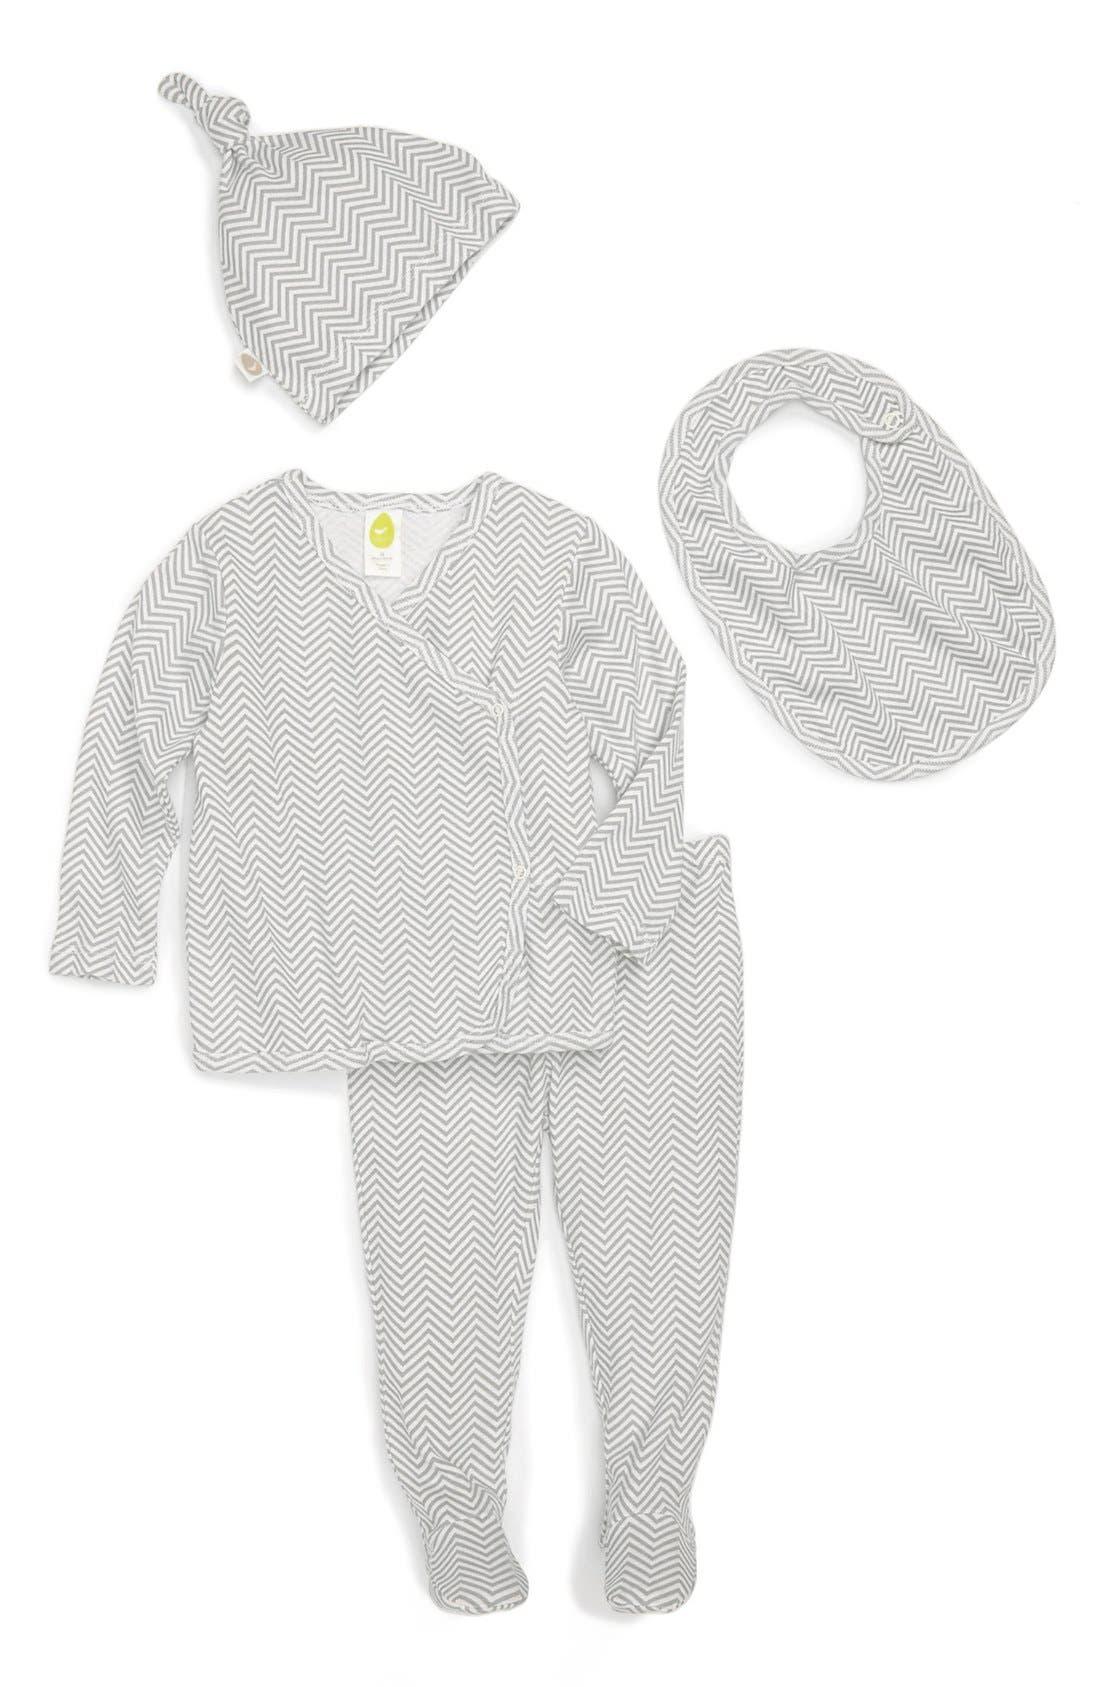 Main Image - Stem Baby Organic Cotton Shirt, Pants, Hat & Bib (Baby)